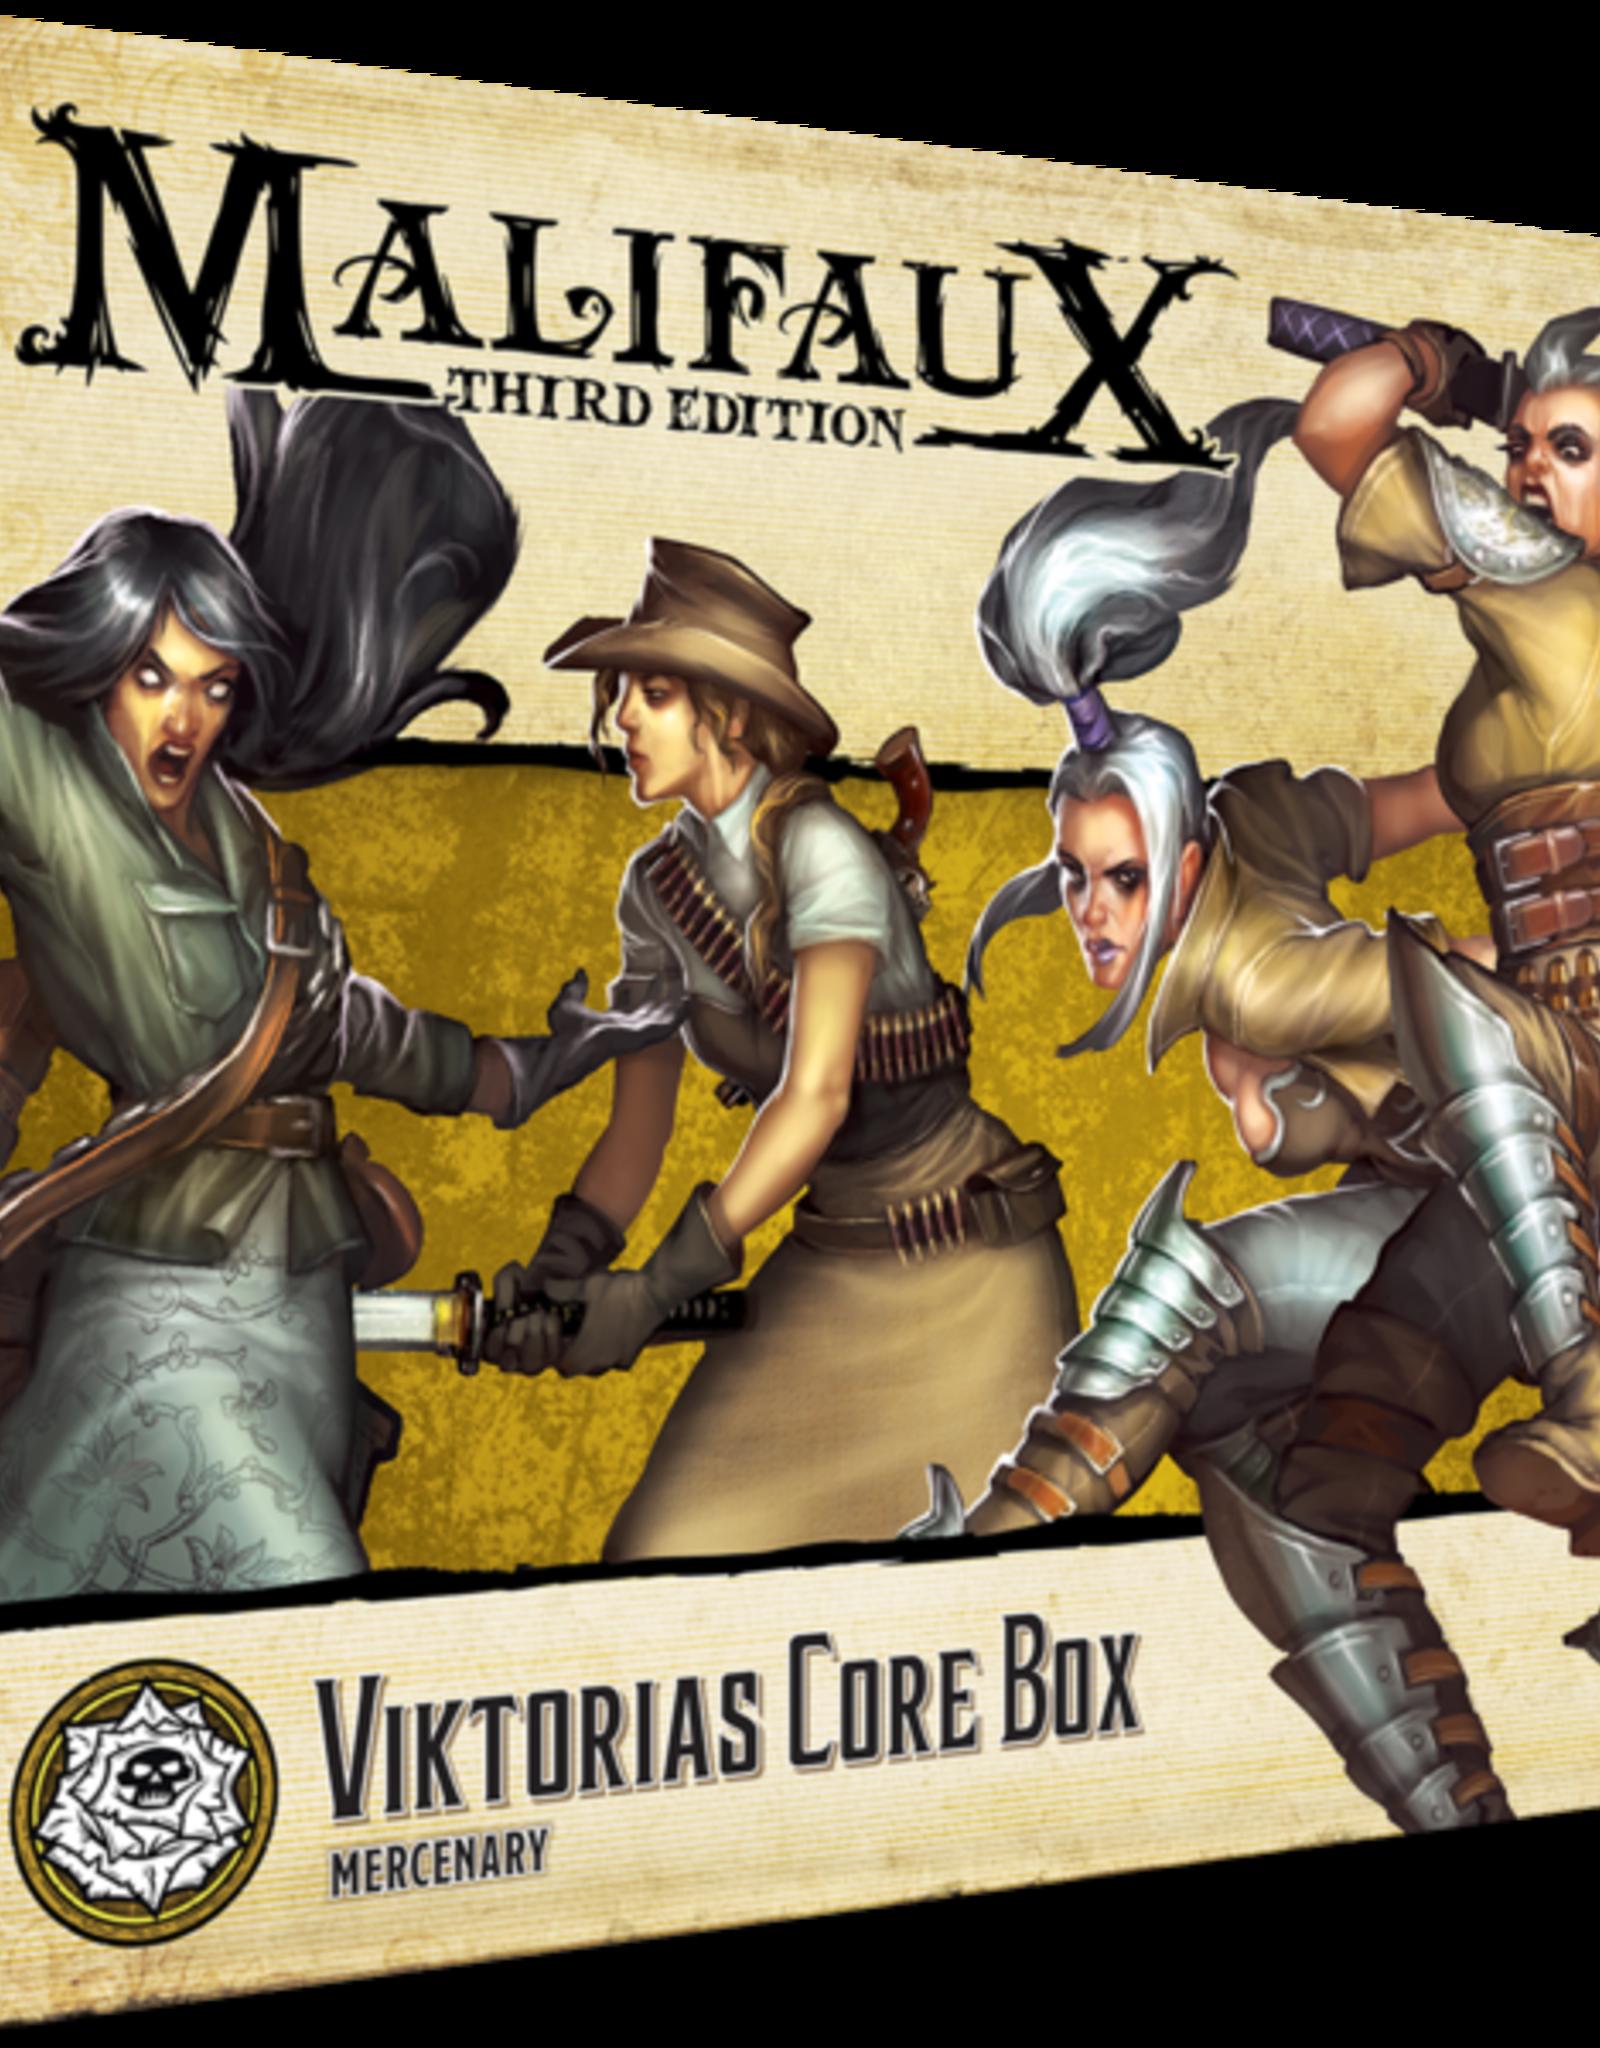 WYR - Malifaux Miniaturen Malifaux 3rd Edition - Viktoria Core Box - EN